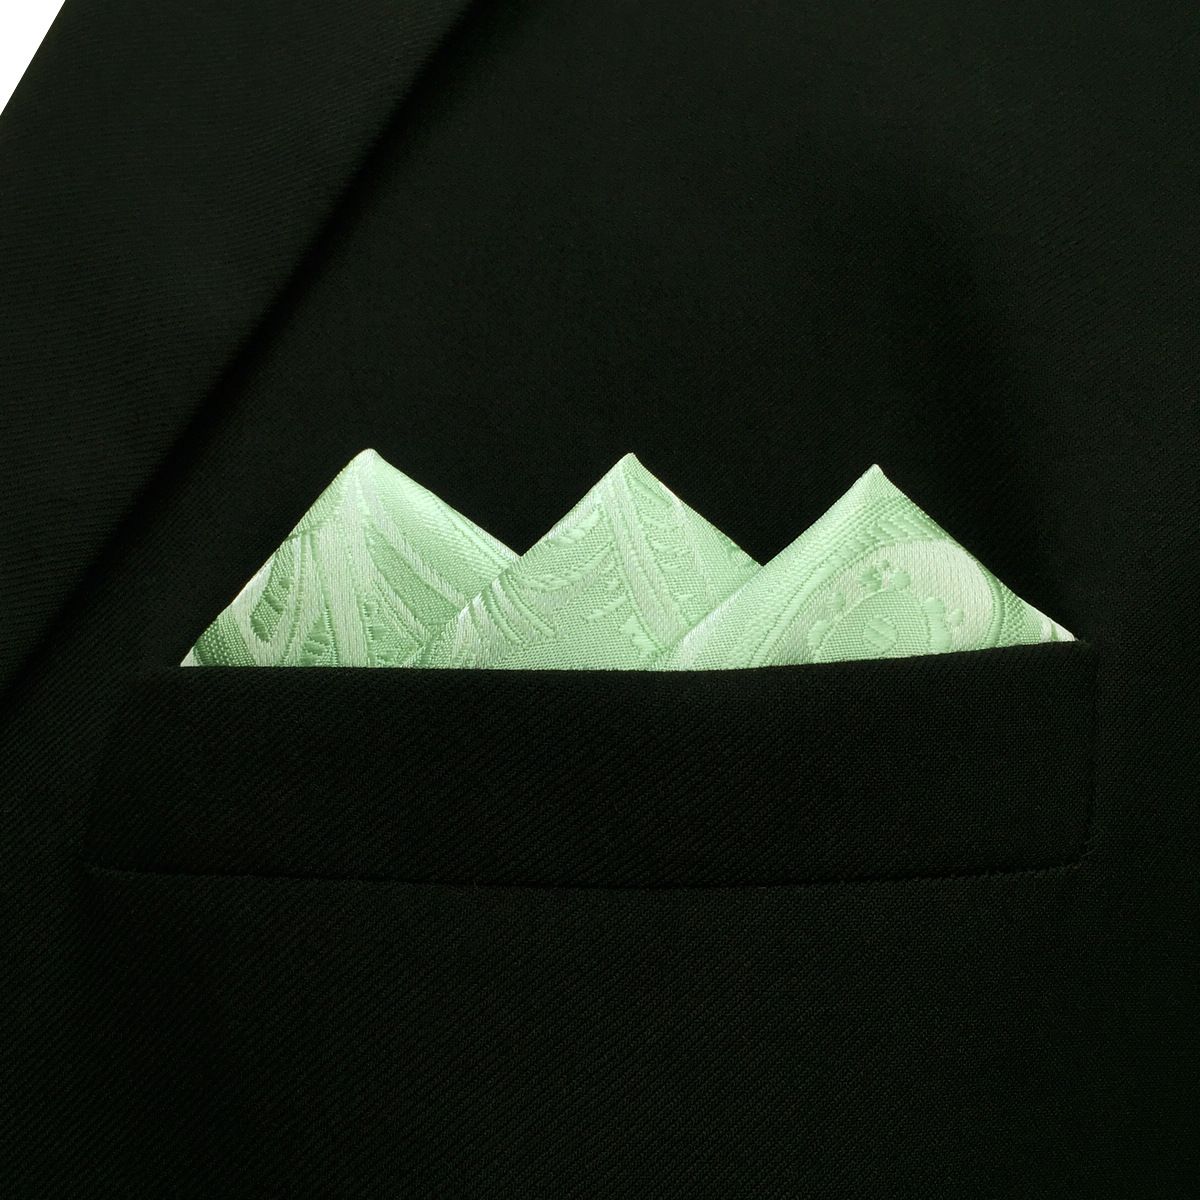 SHLAX/&WING Solid Color Mens Pocket Square Silk Paisley Light Green Honeydew